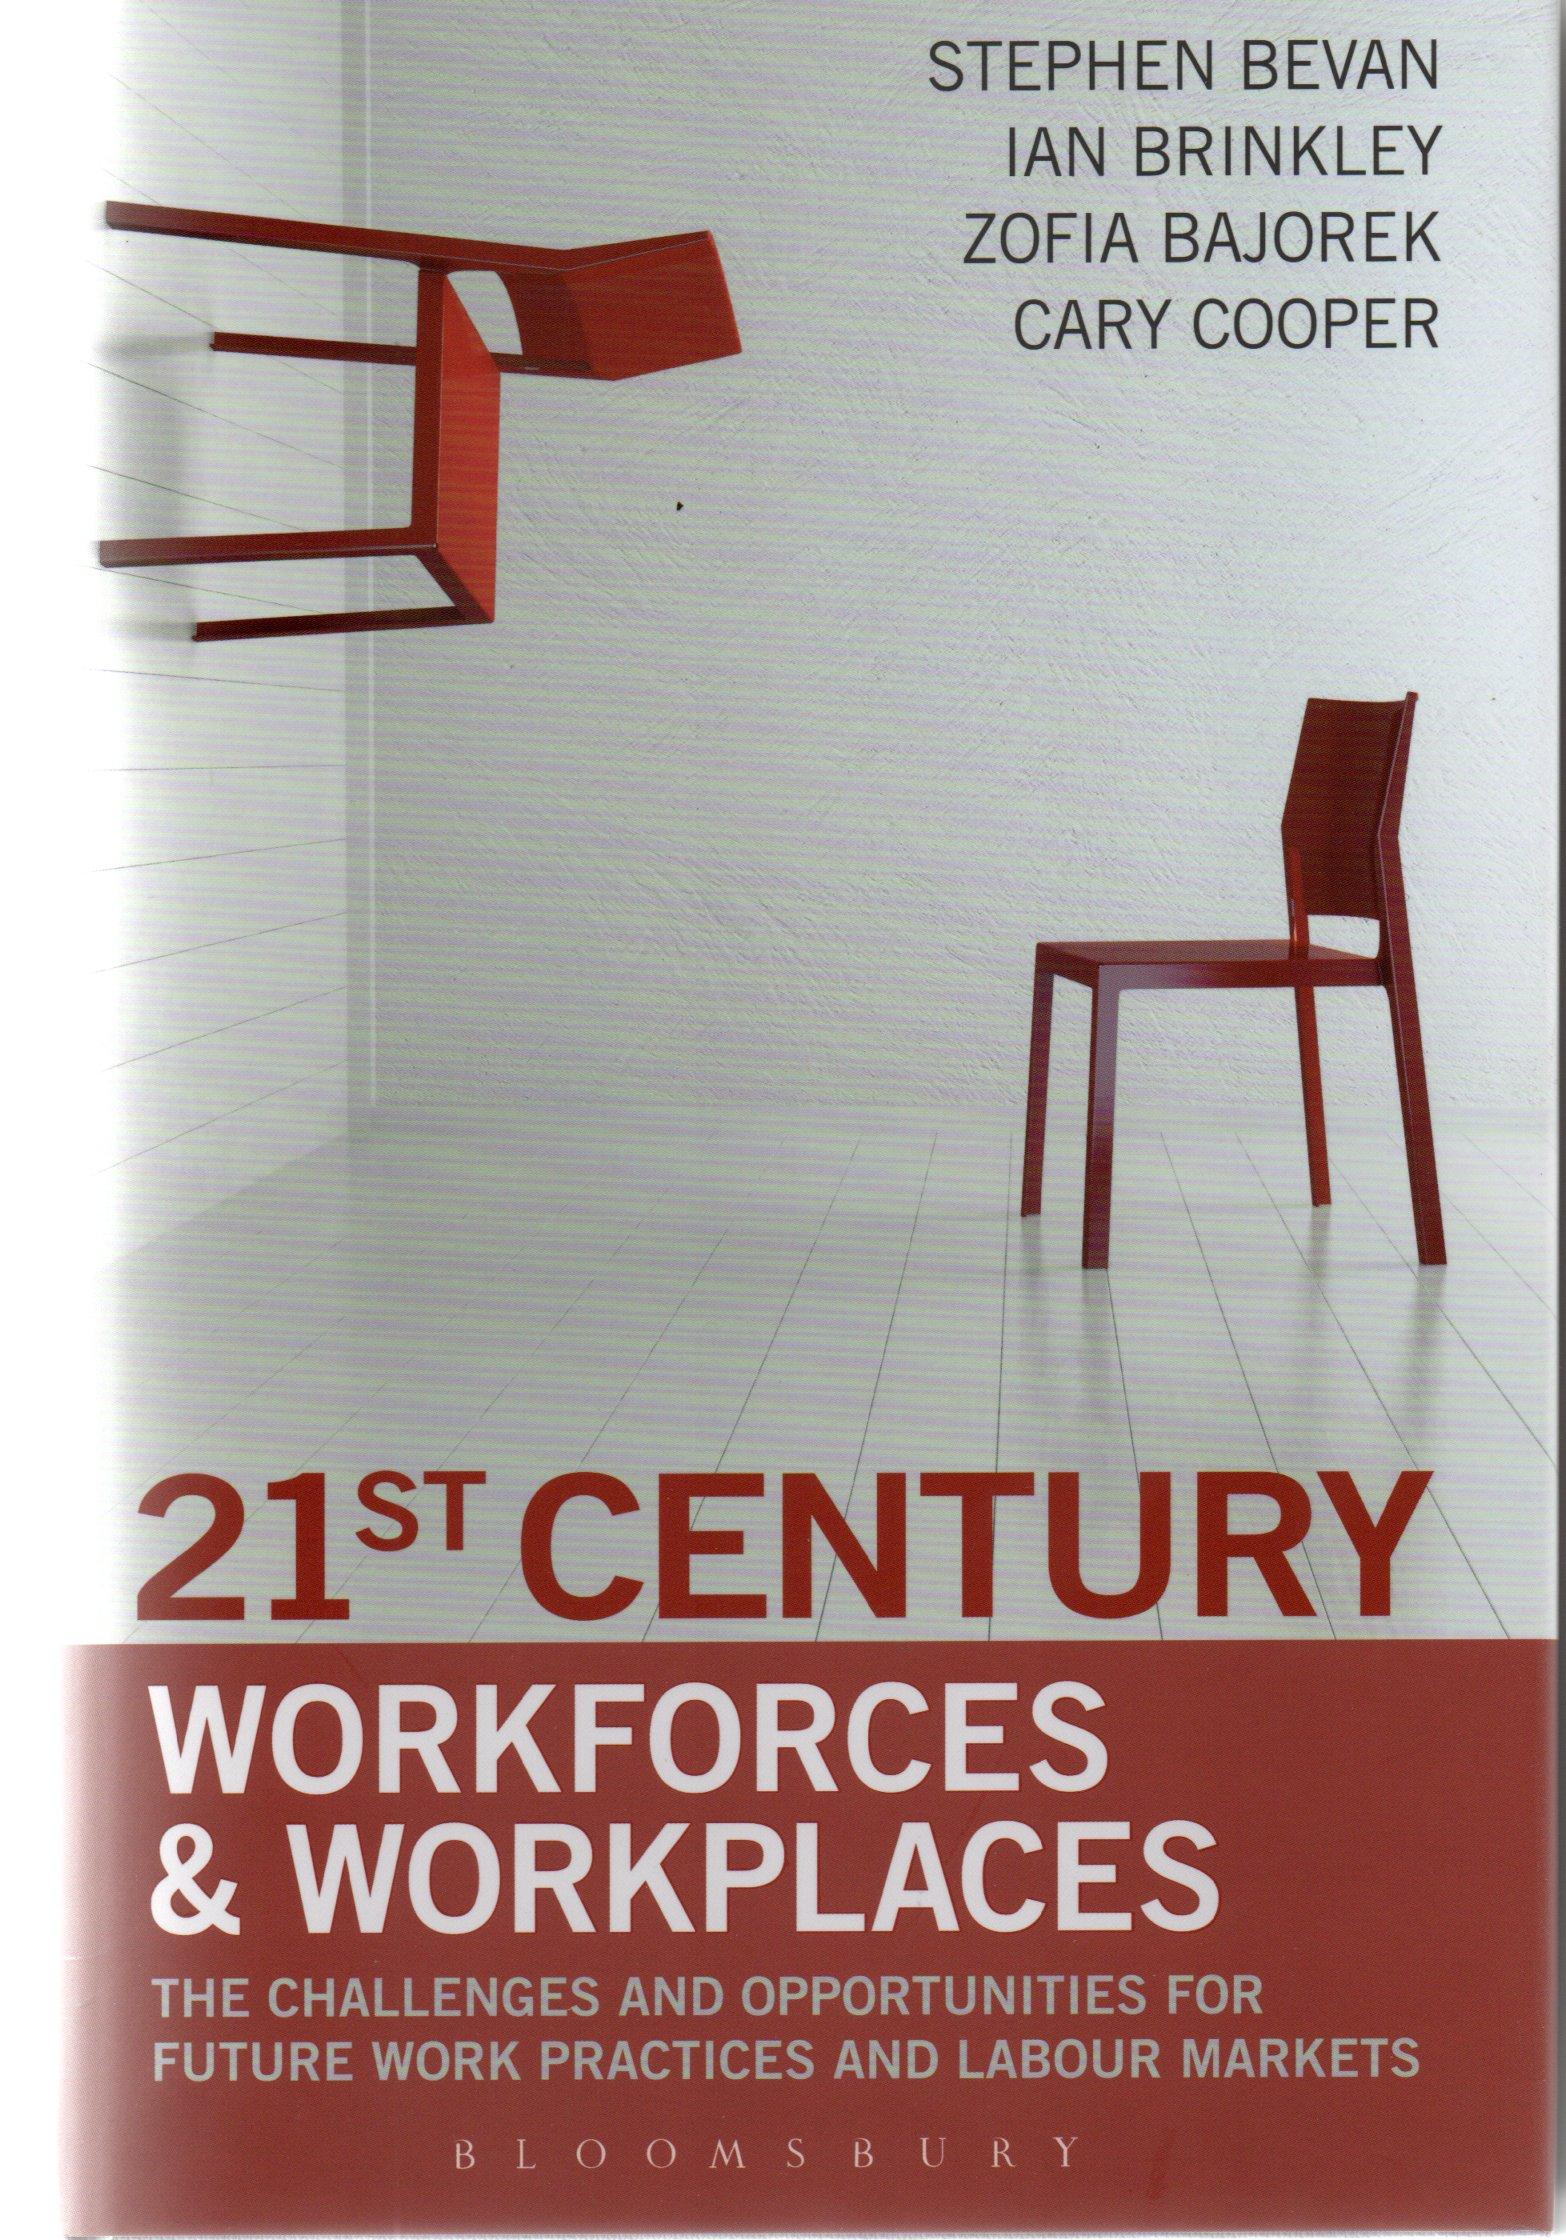 21st century workforces & workplaces / Stephen Bevan [et al.]